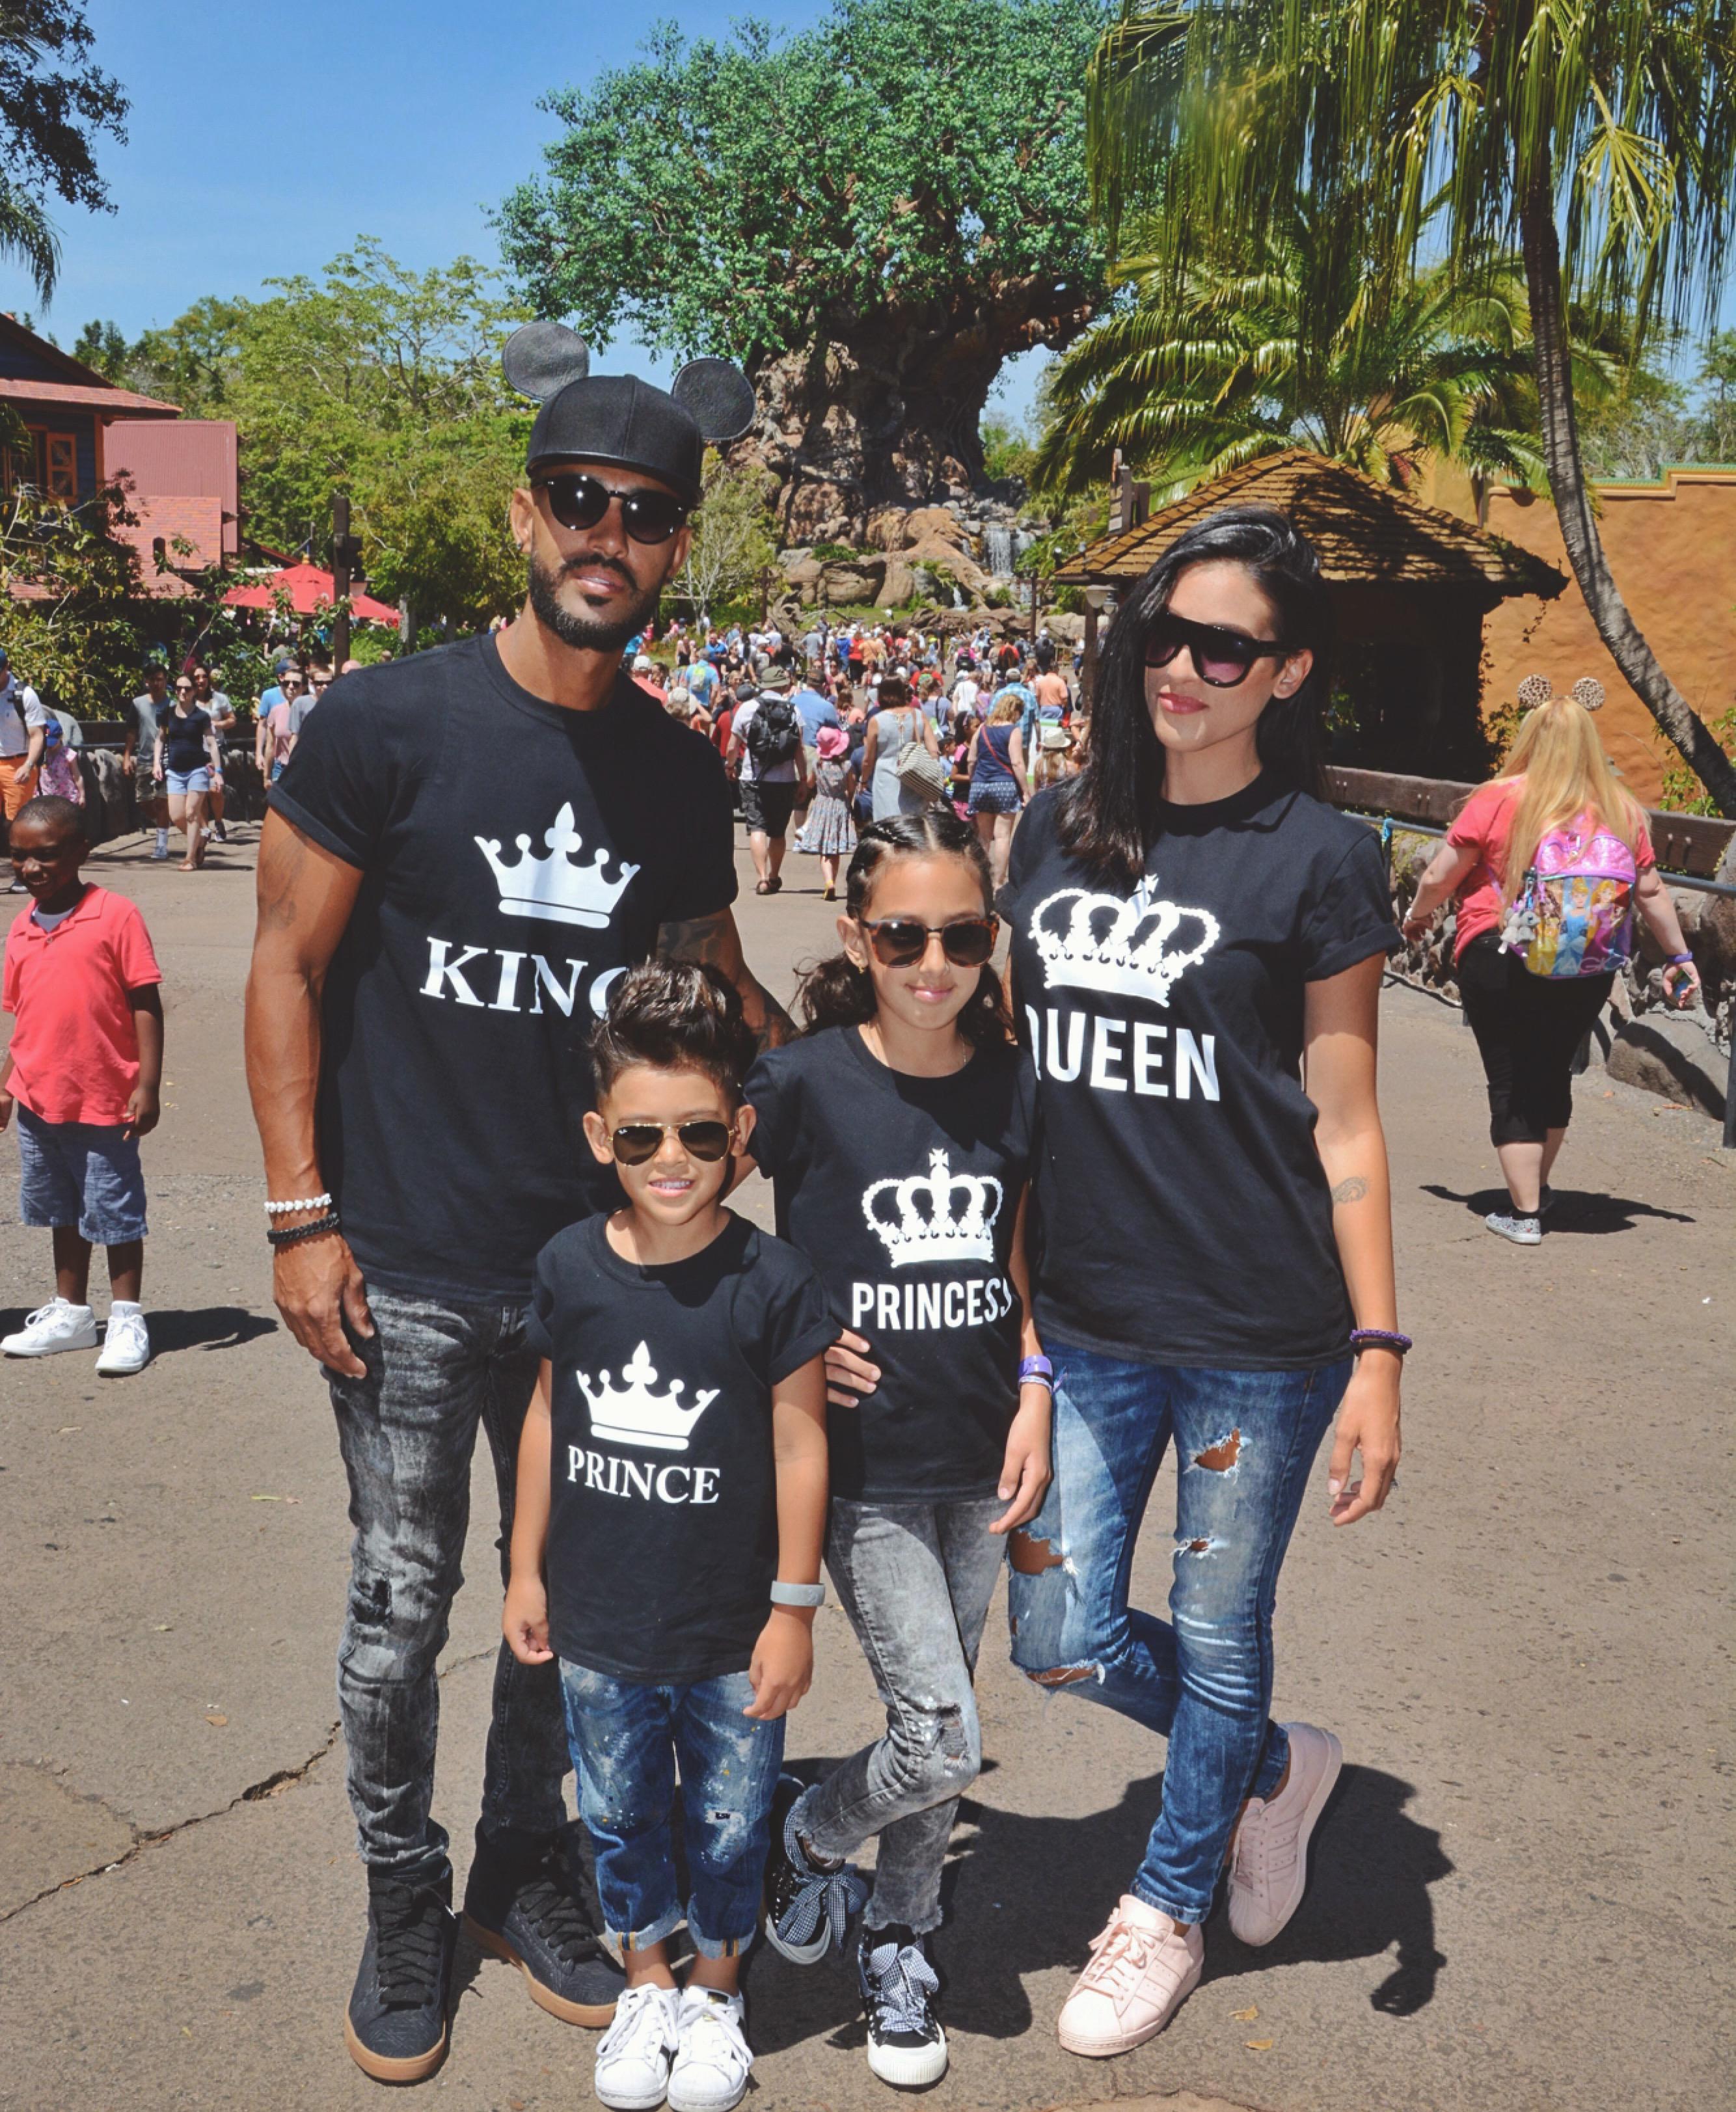 d25037ff King Queen Prince Princess Family Shirts, Matching Family Shirts